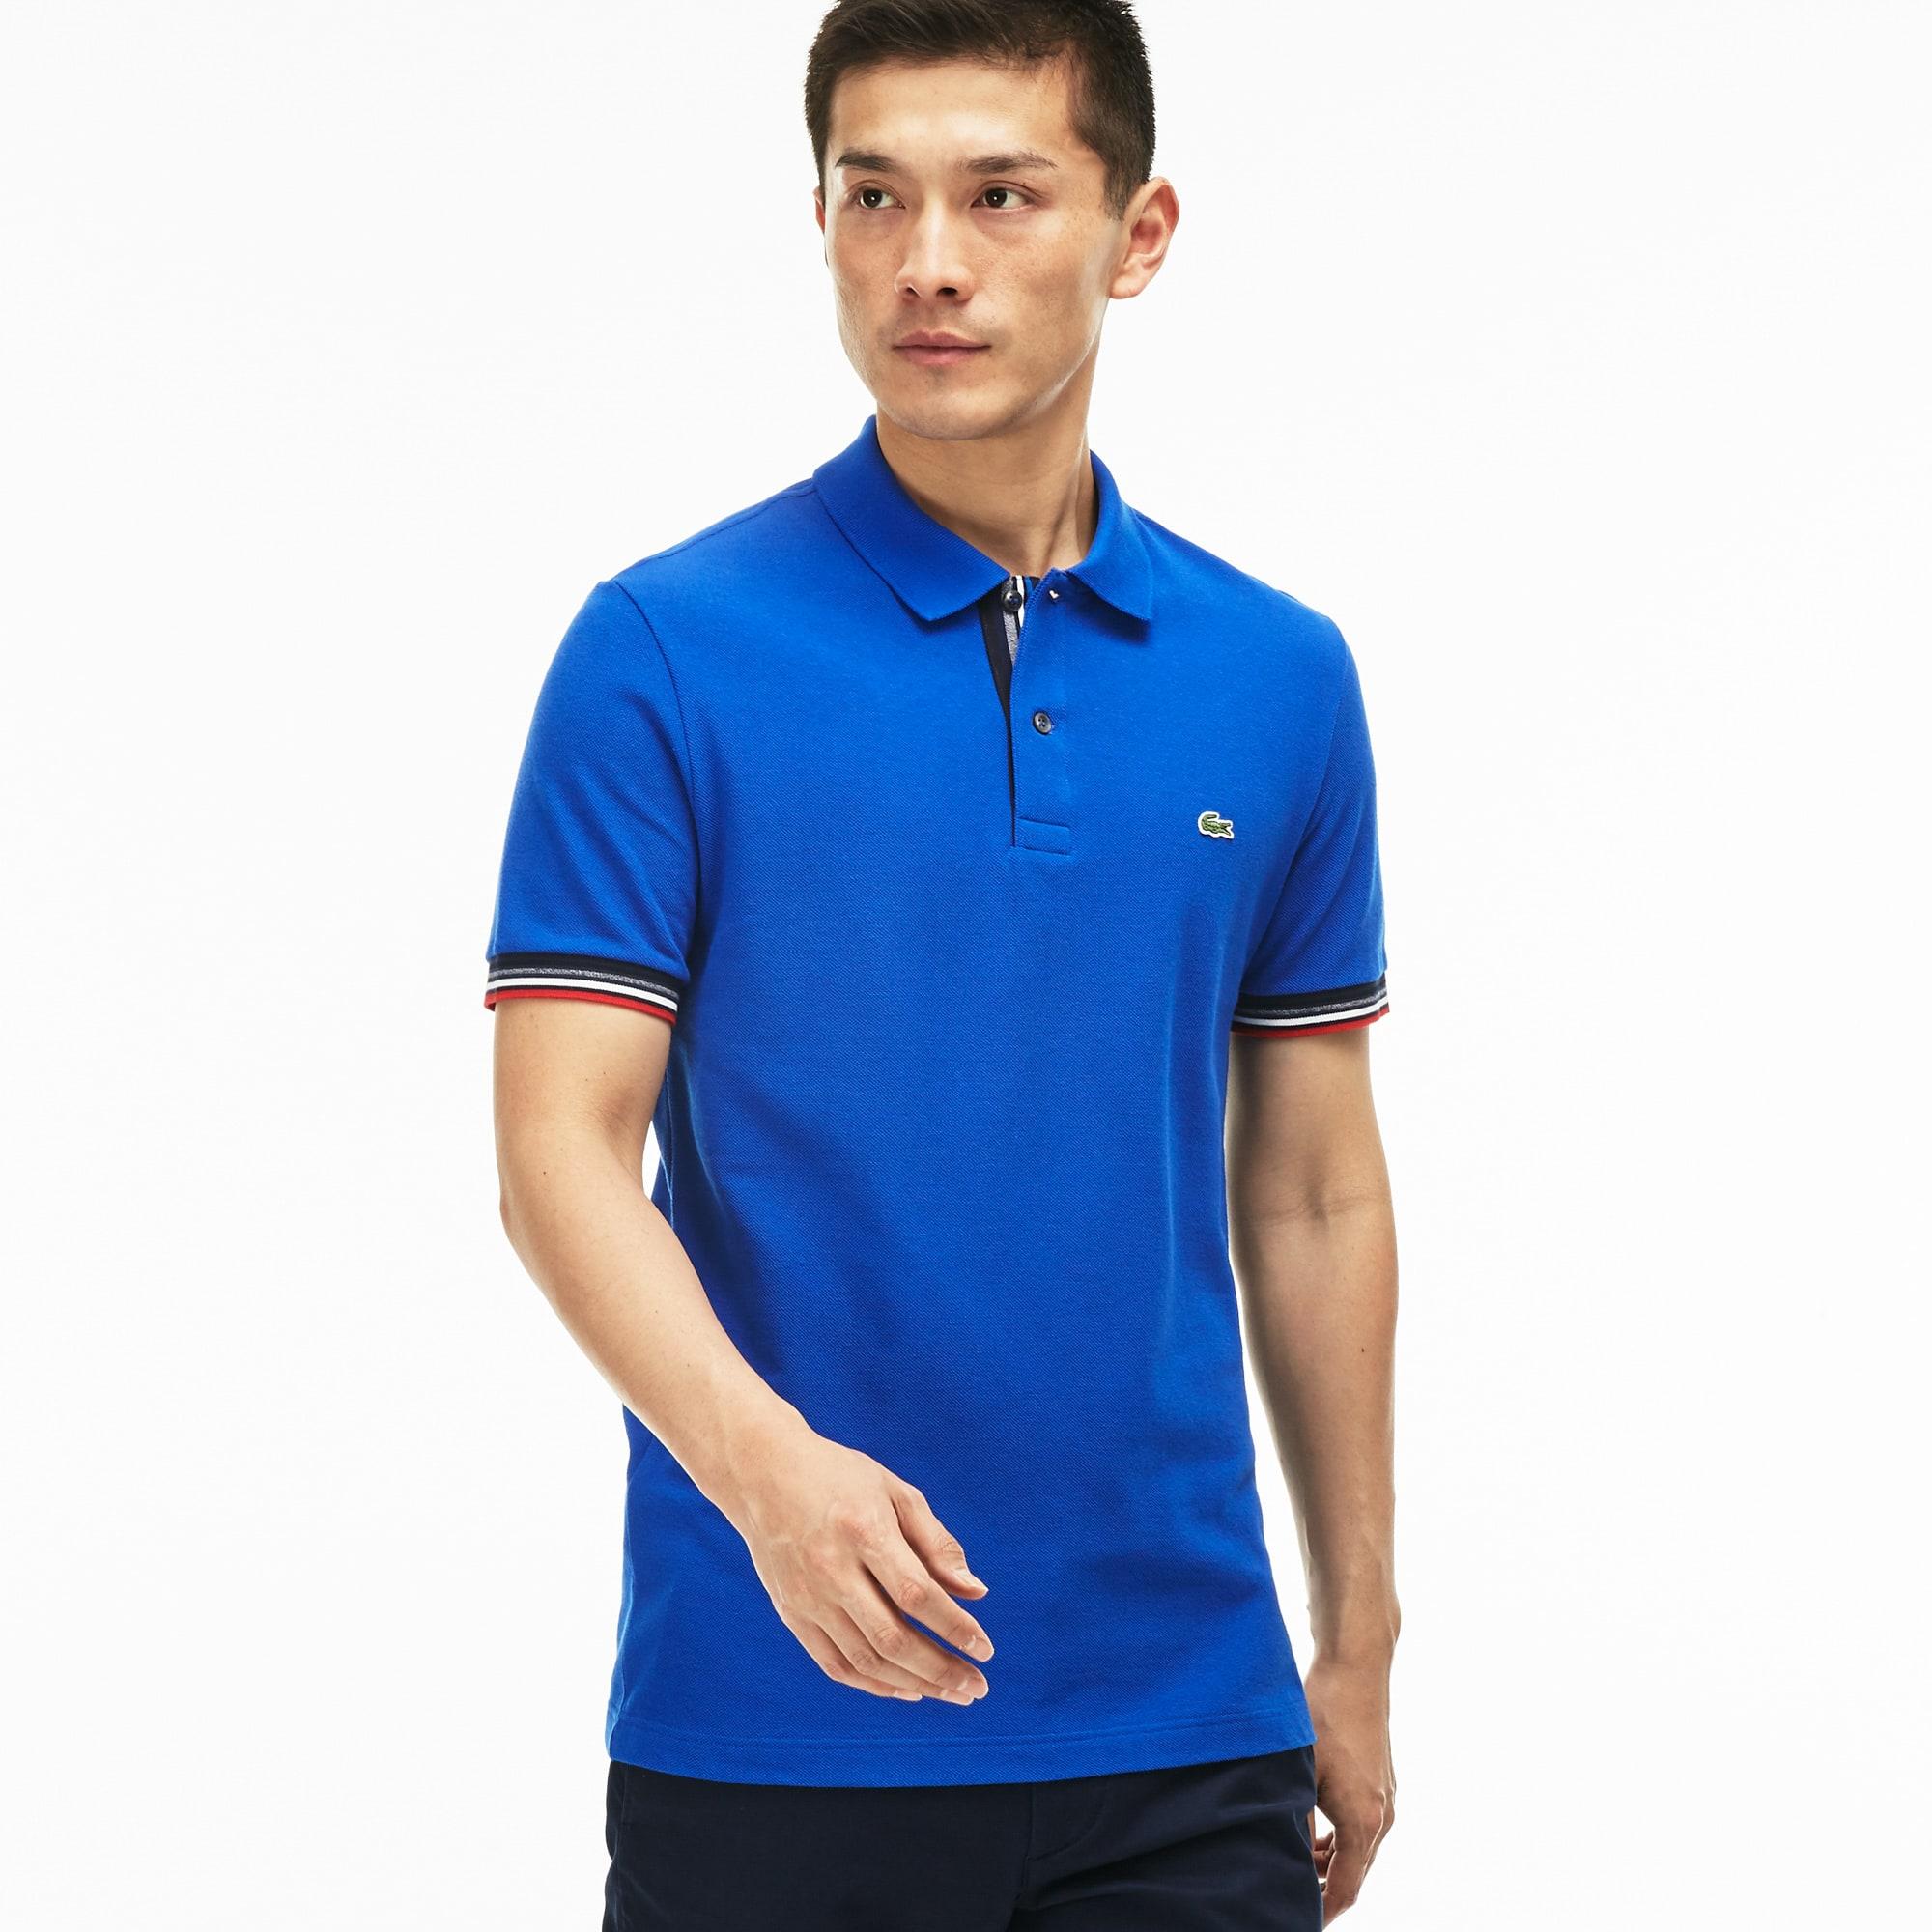 Slim Fit Herren-Poloshirt aus doppellagigem Baumwoll-Petit-Piqué